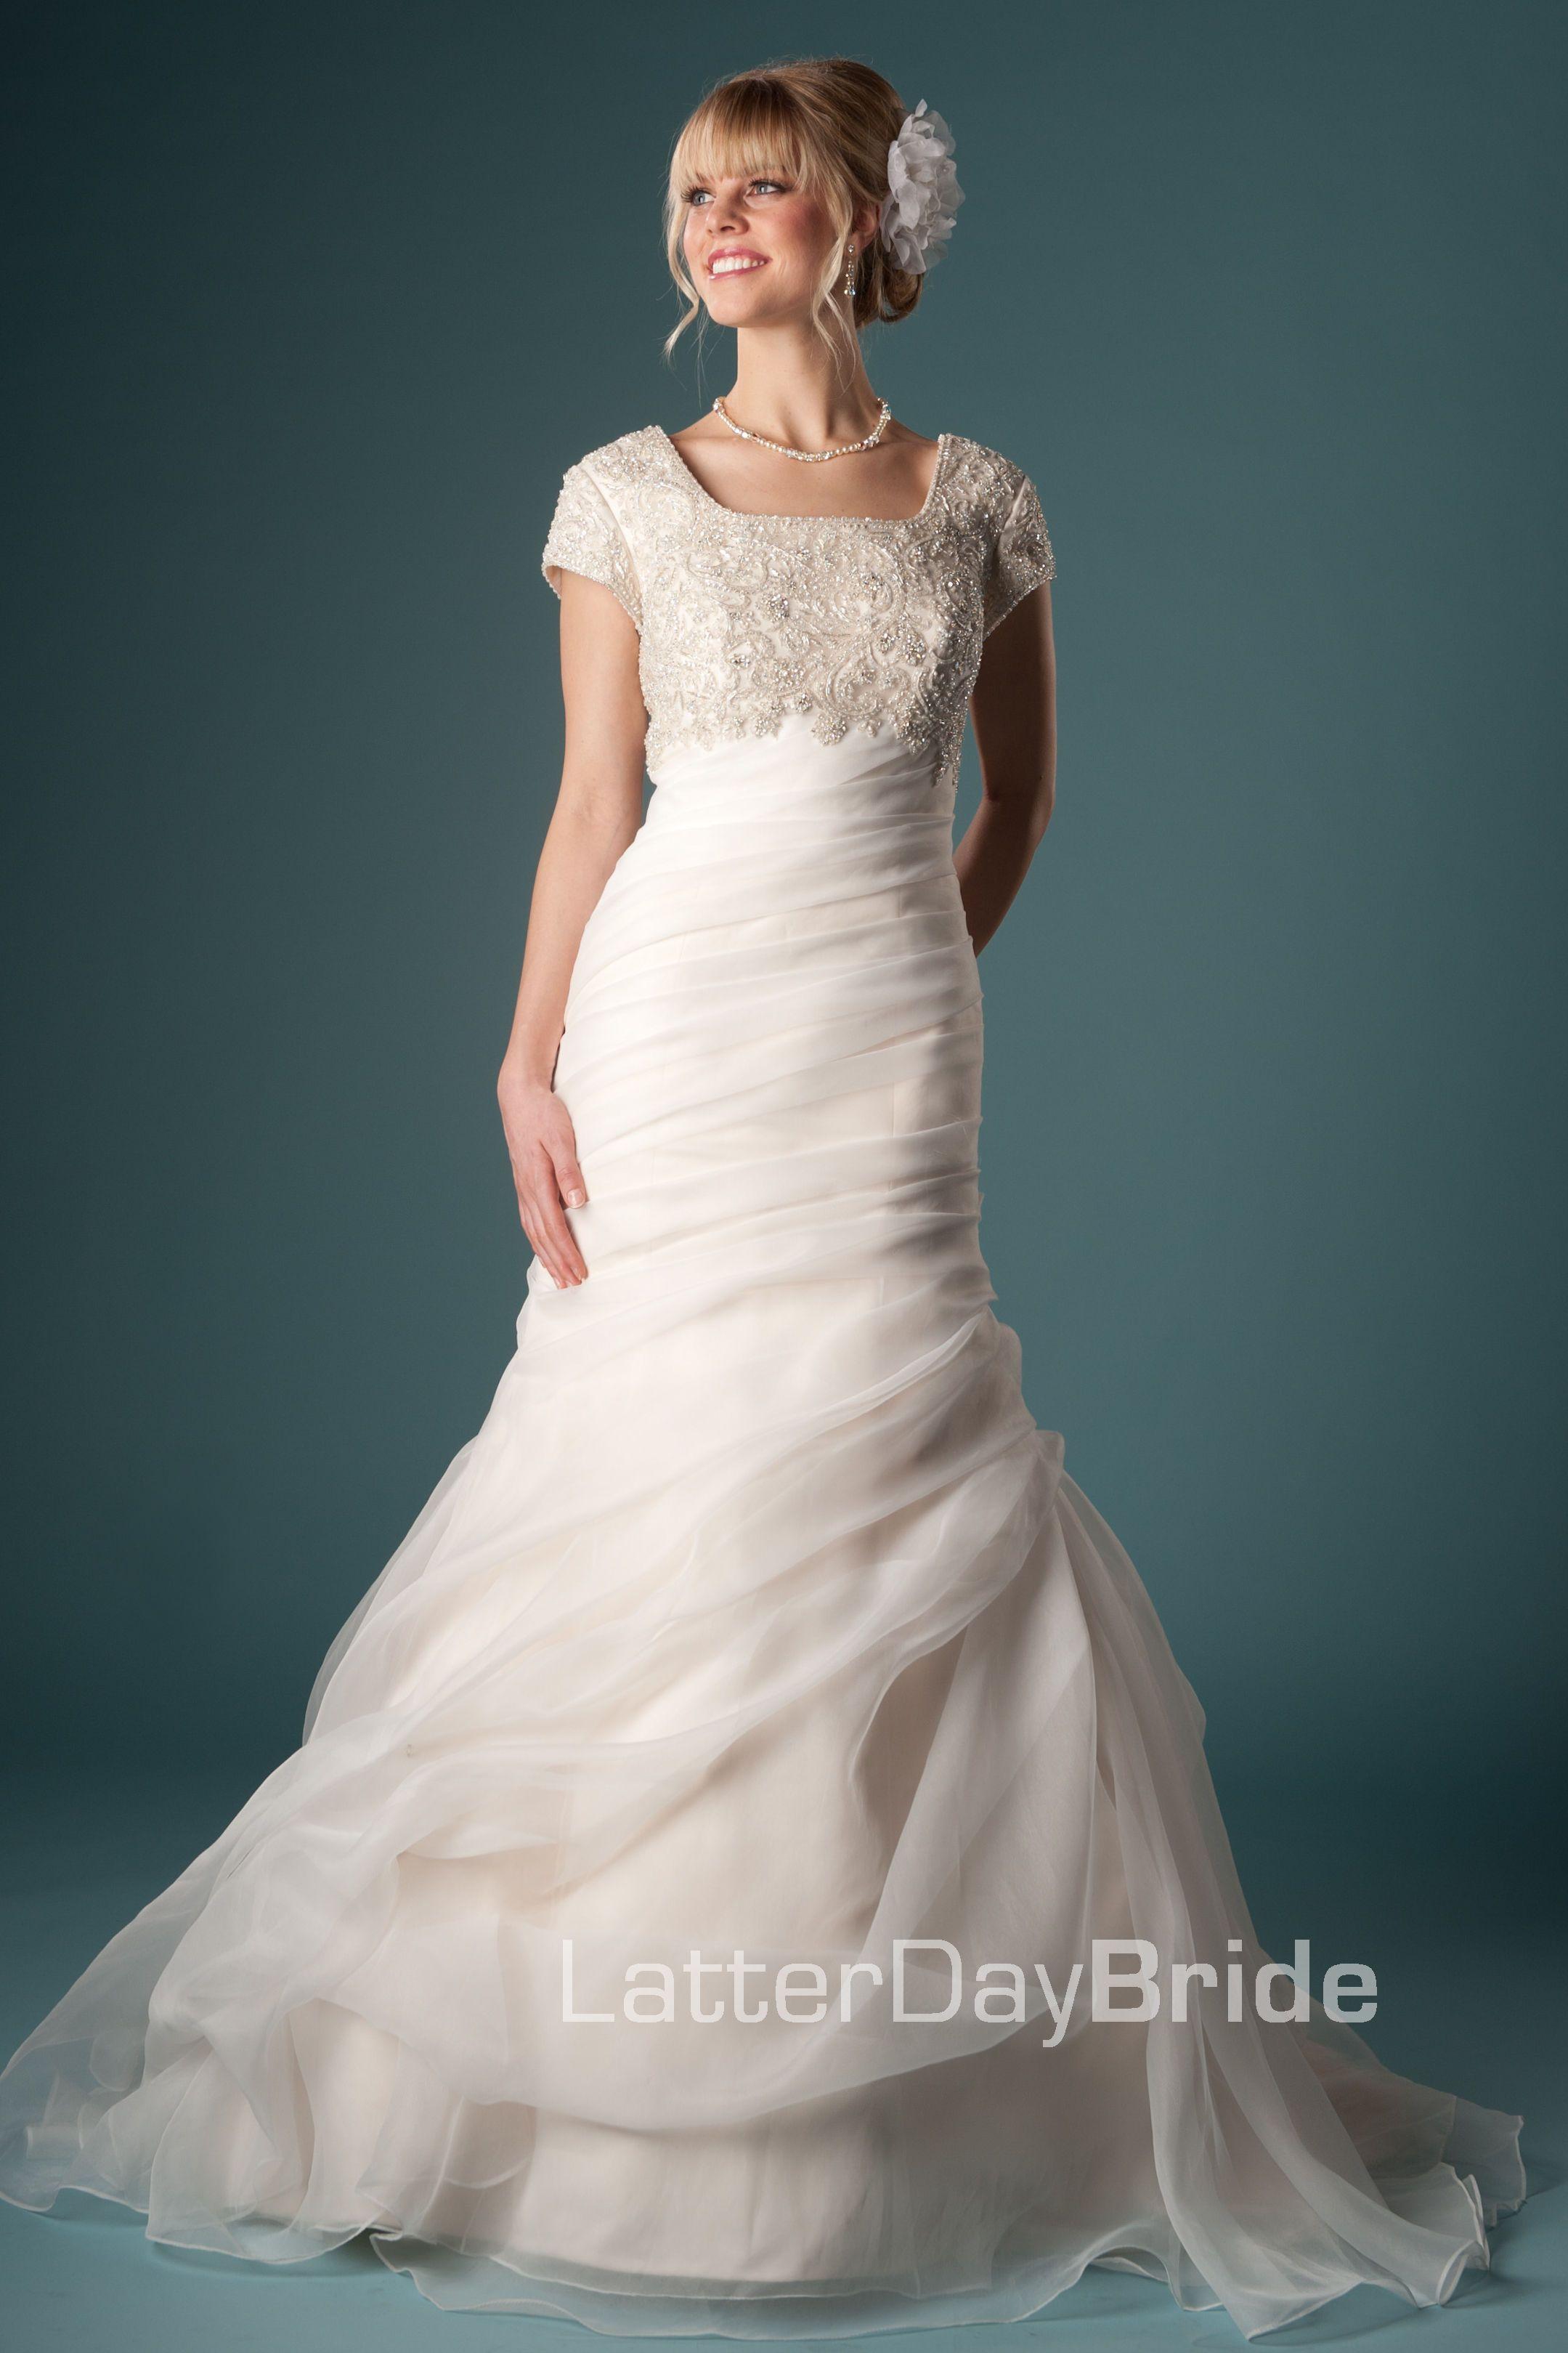 113b413773b4 Modest Wedding Dress, Fabiana   LatterDayBride & Prom   Wedding ...